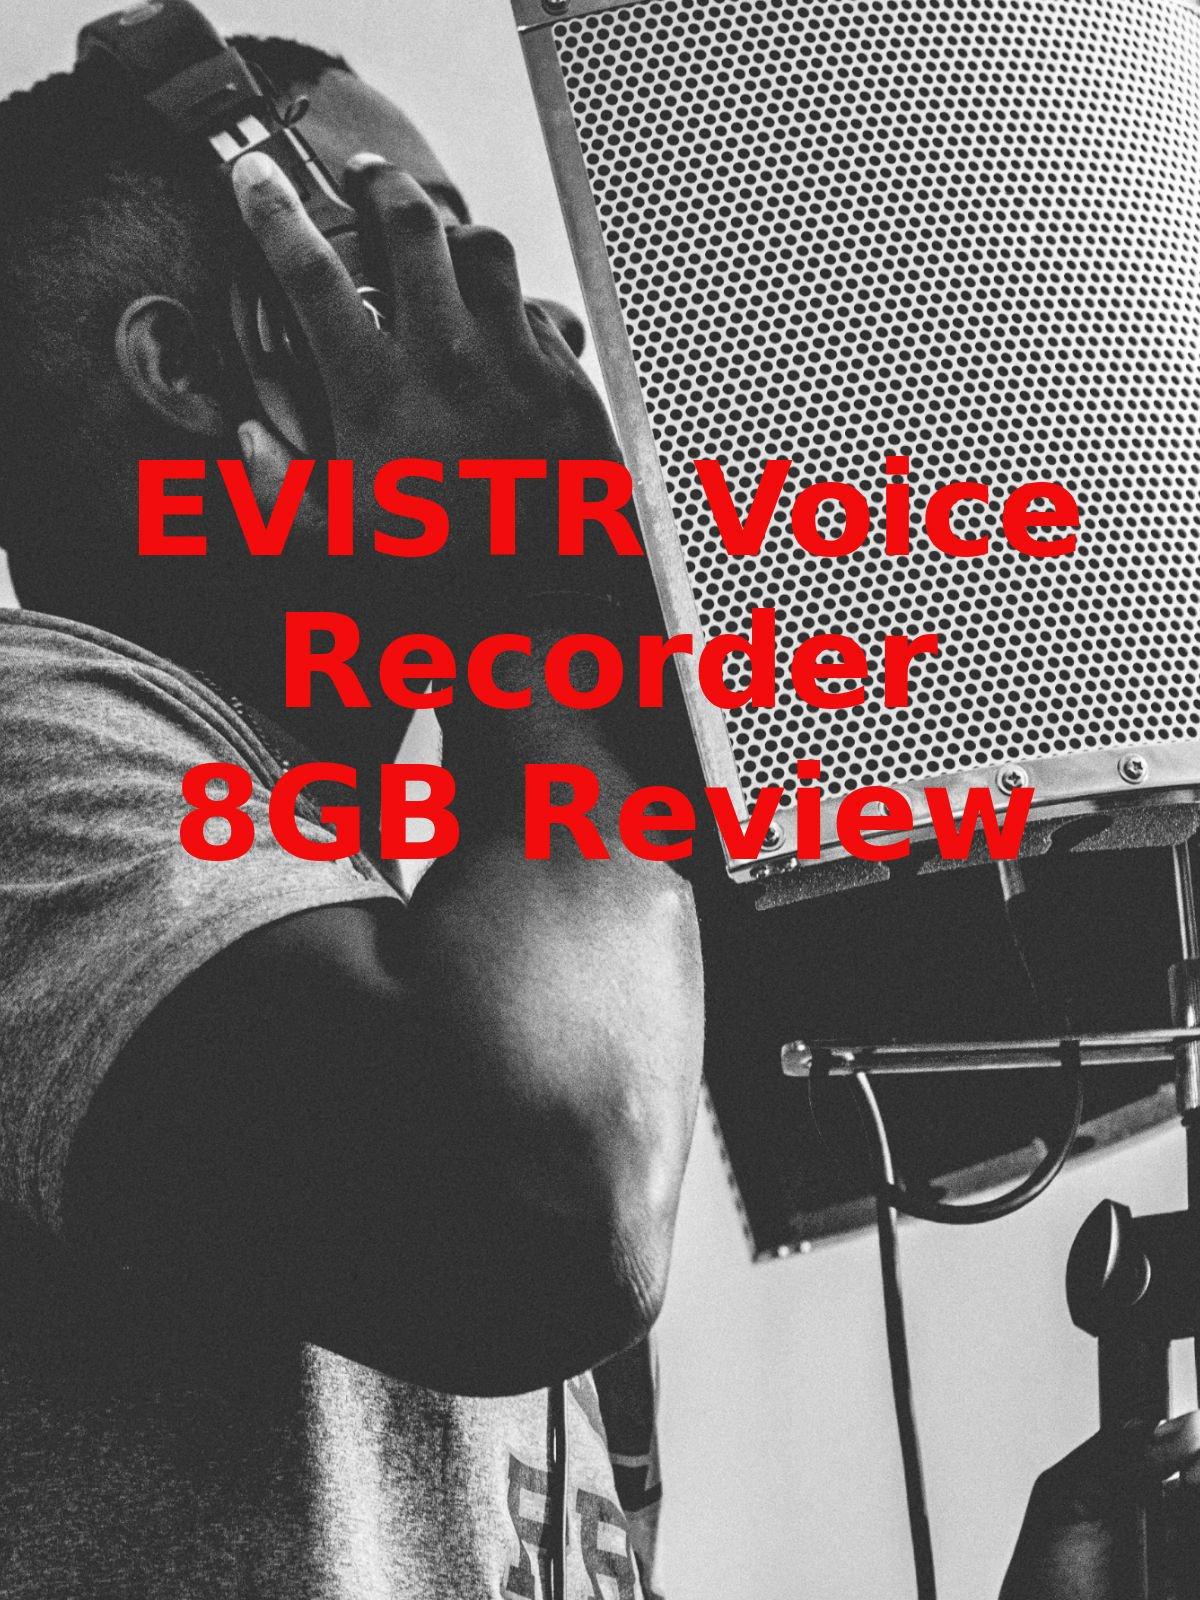 Review: EVISTR Voice Recorder 8GB Review on Amazon Prime Video UK